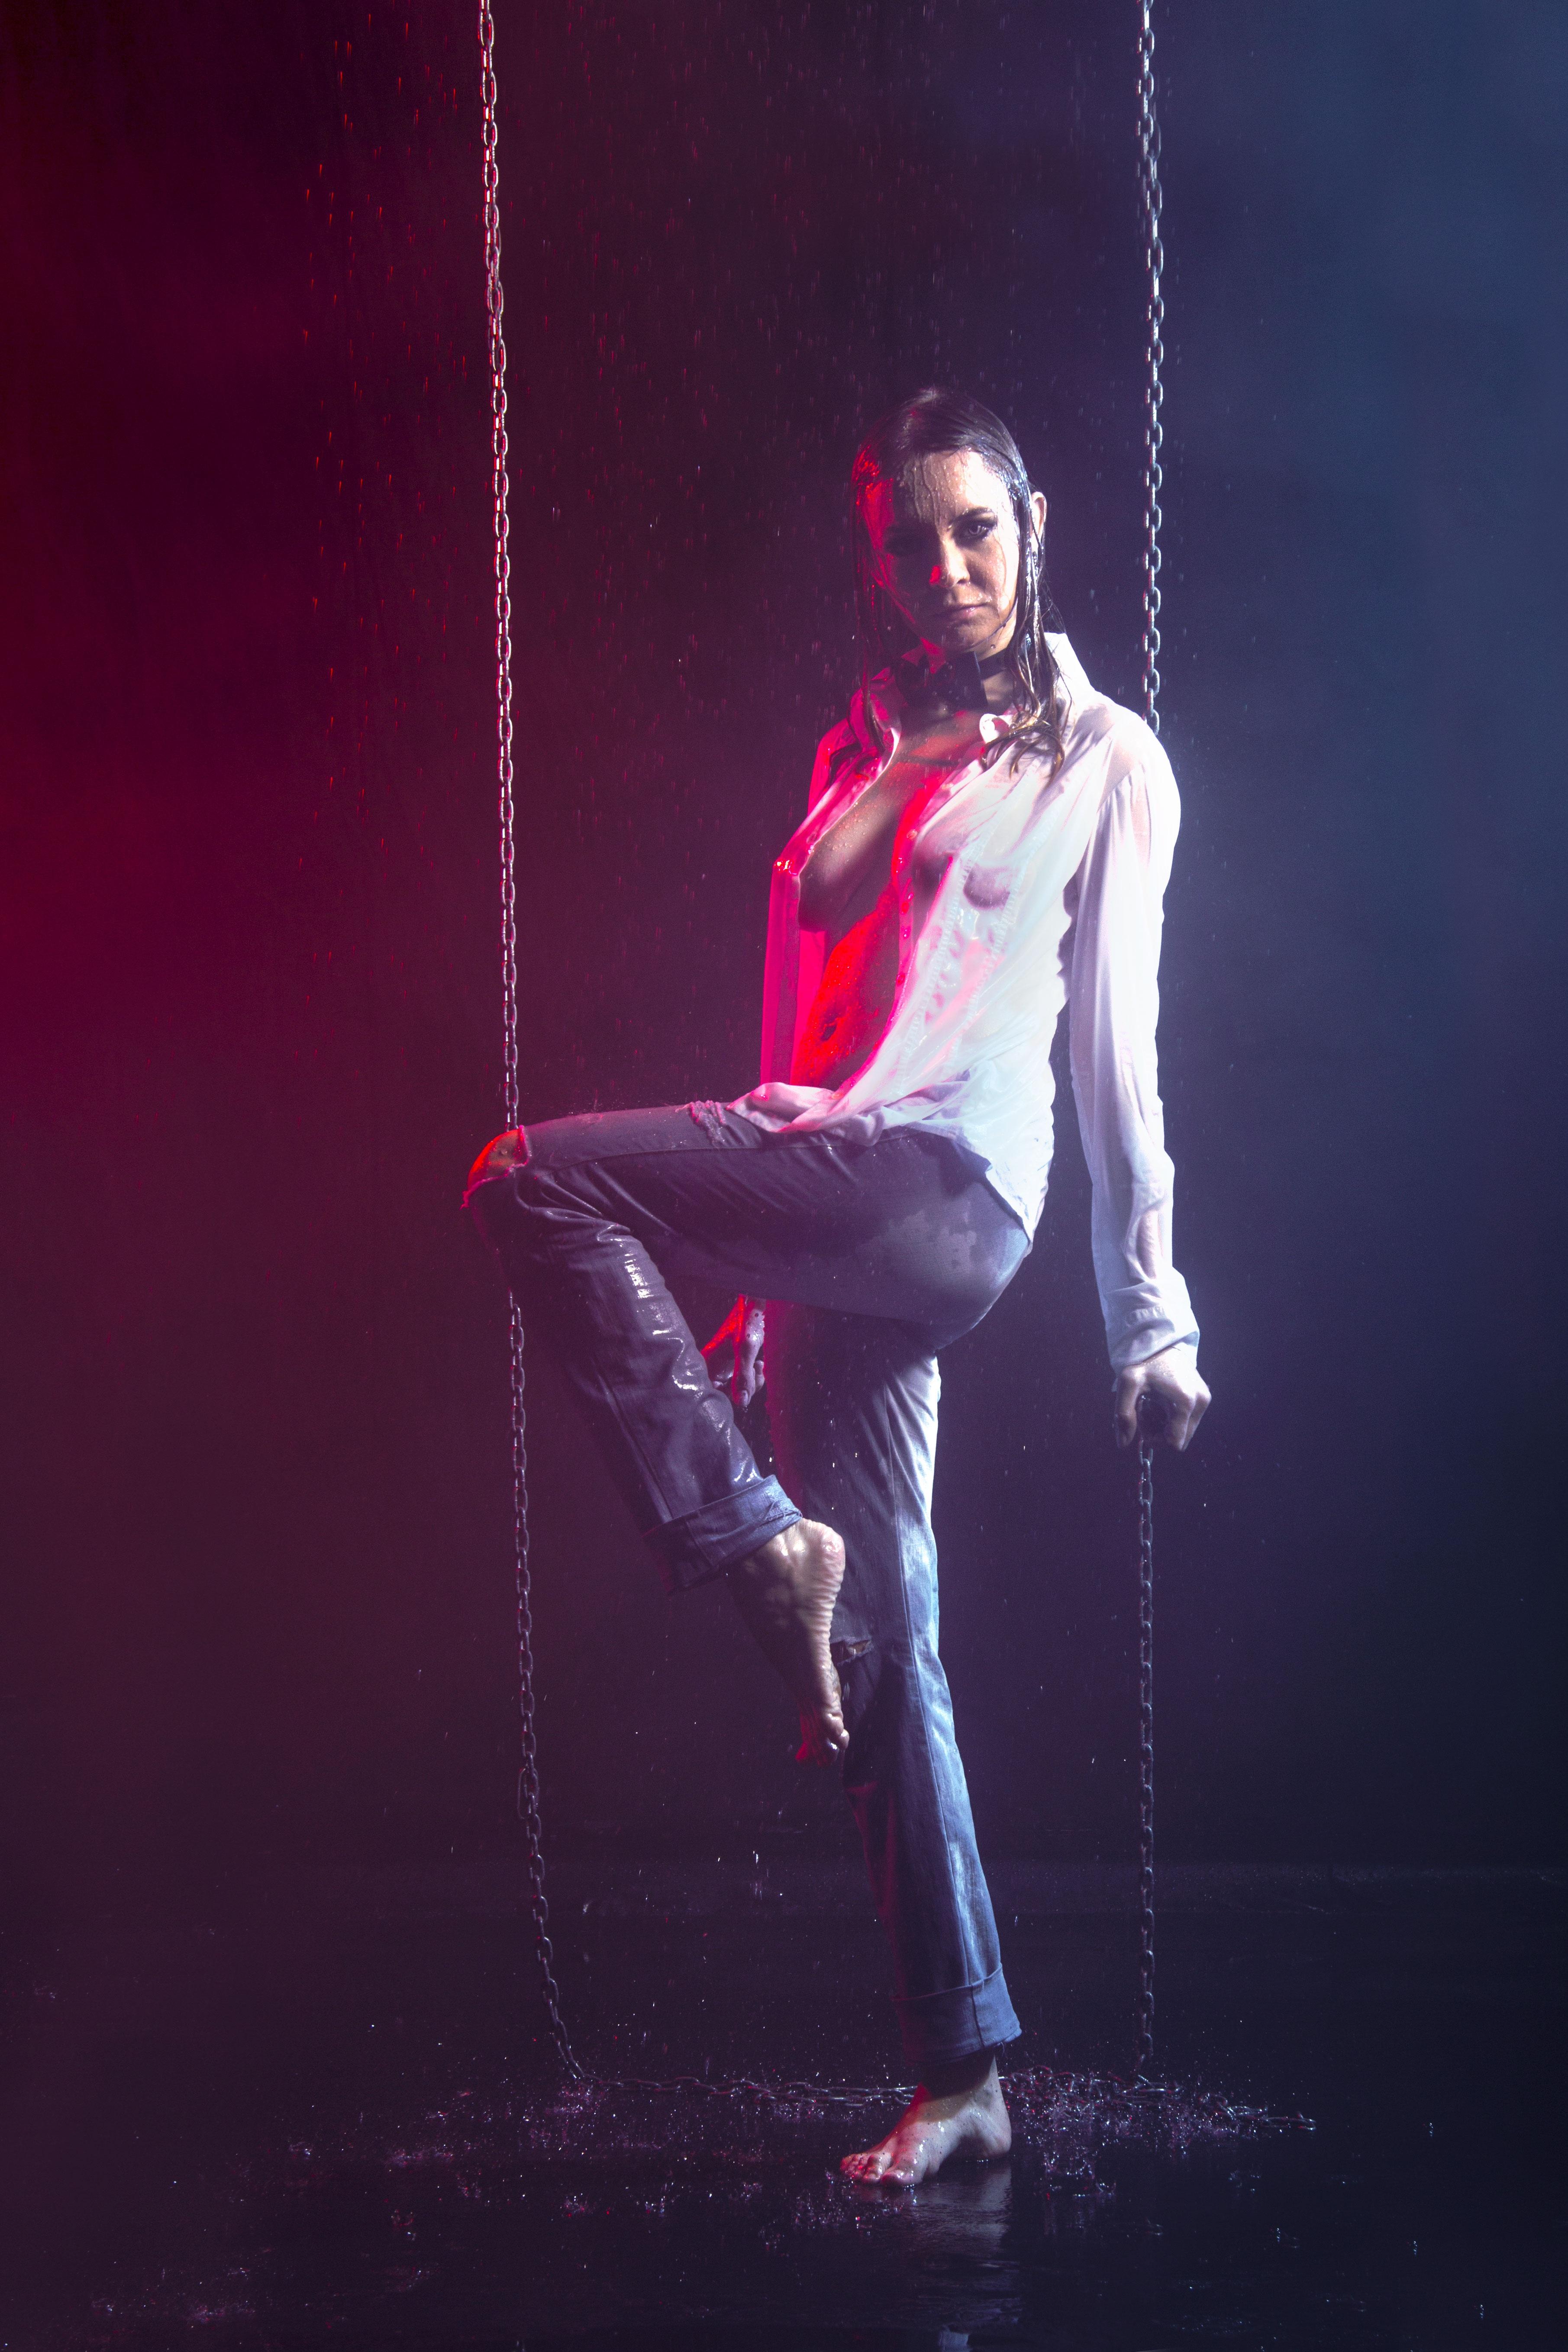 nude acrobatics